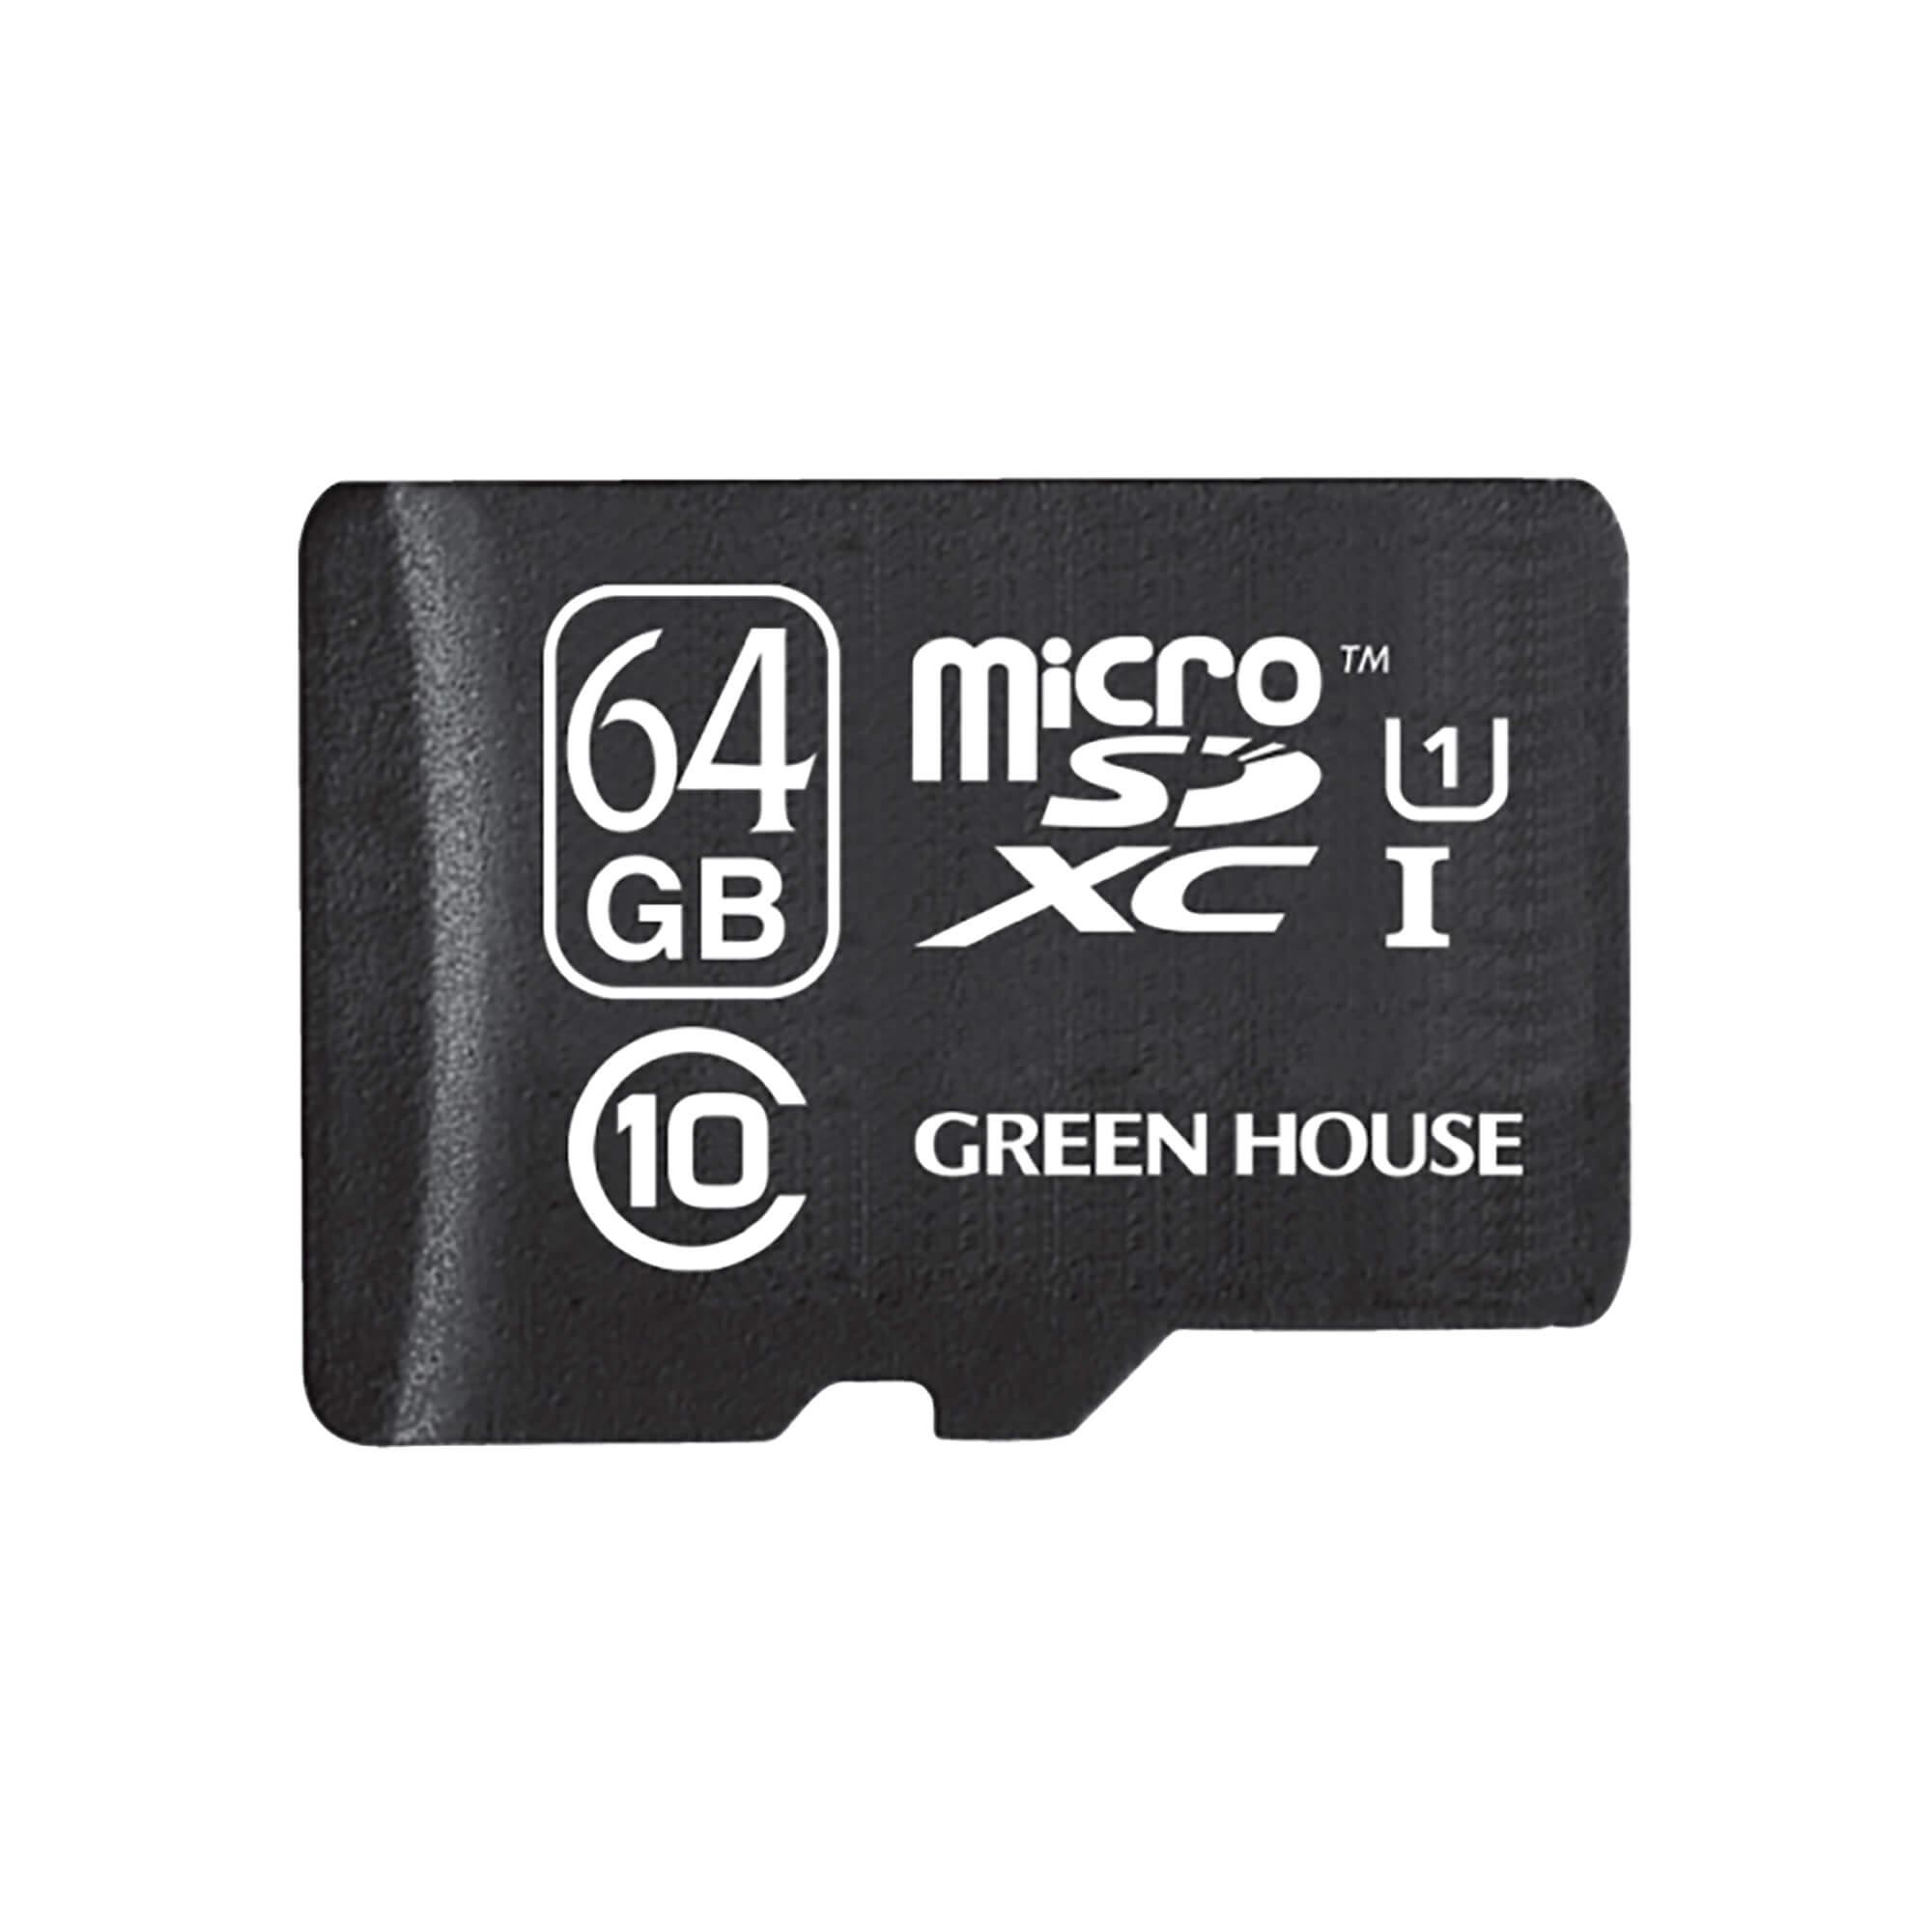 GH-SDMRXC64GU